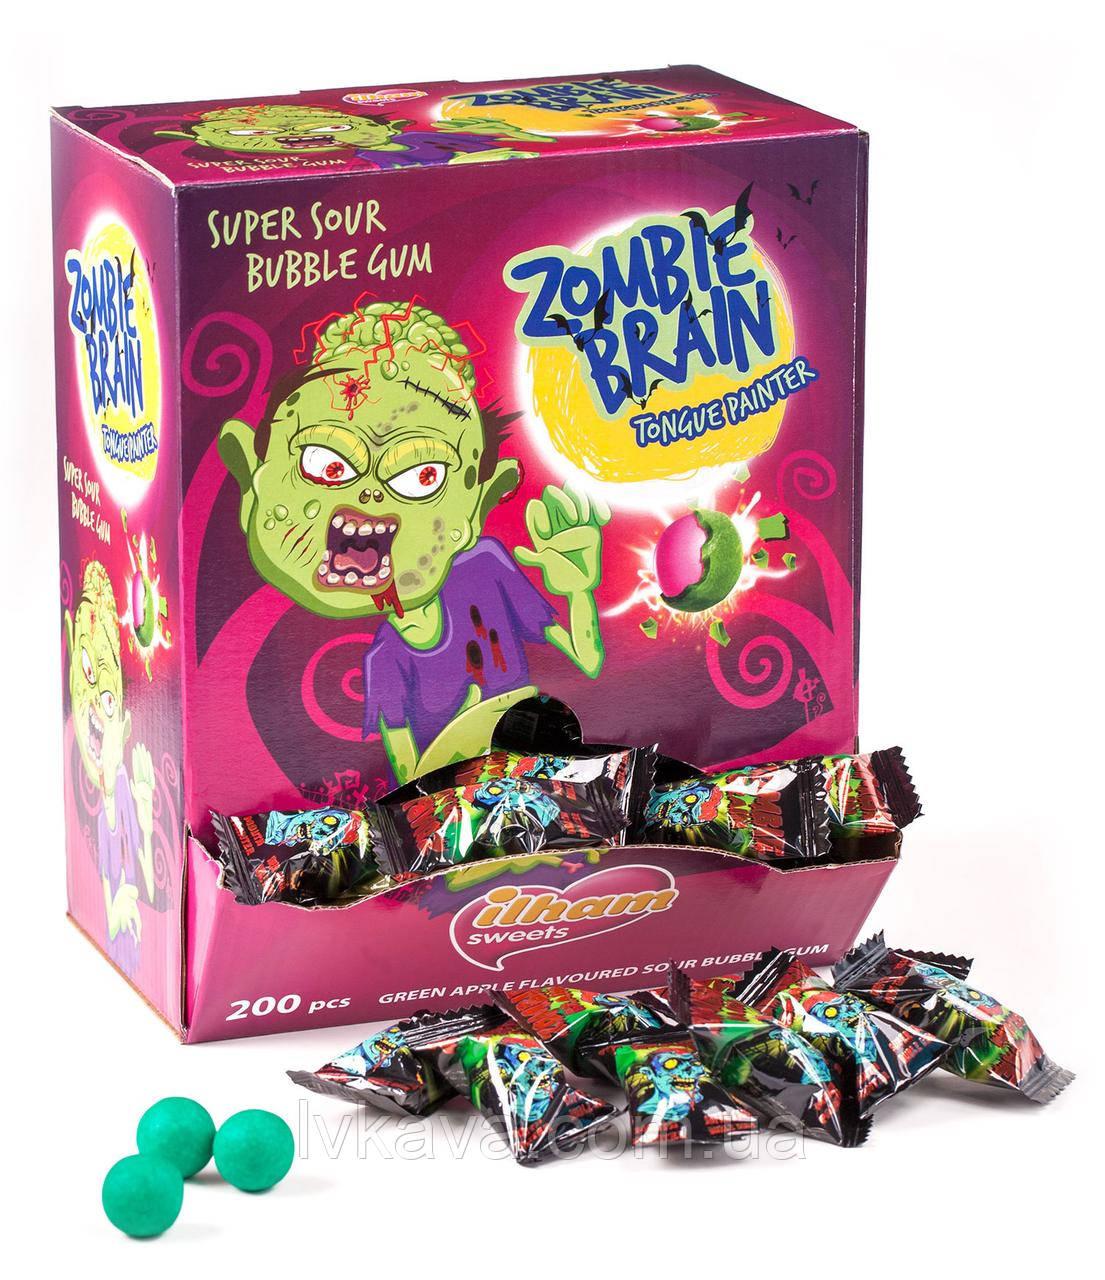 Жевательная резинка  Zombie Brain (красит язык)  ILHAM SWEETS, 3,5 гр х 200 шт